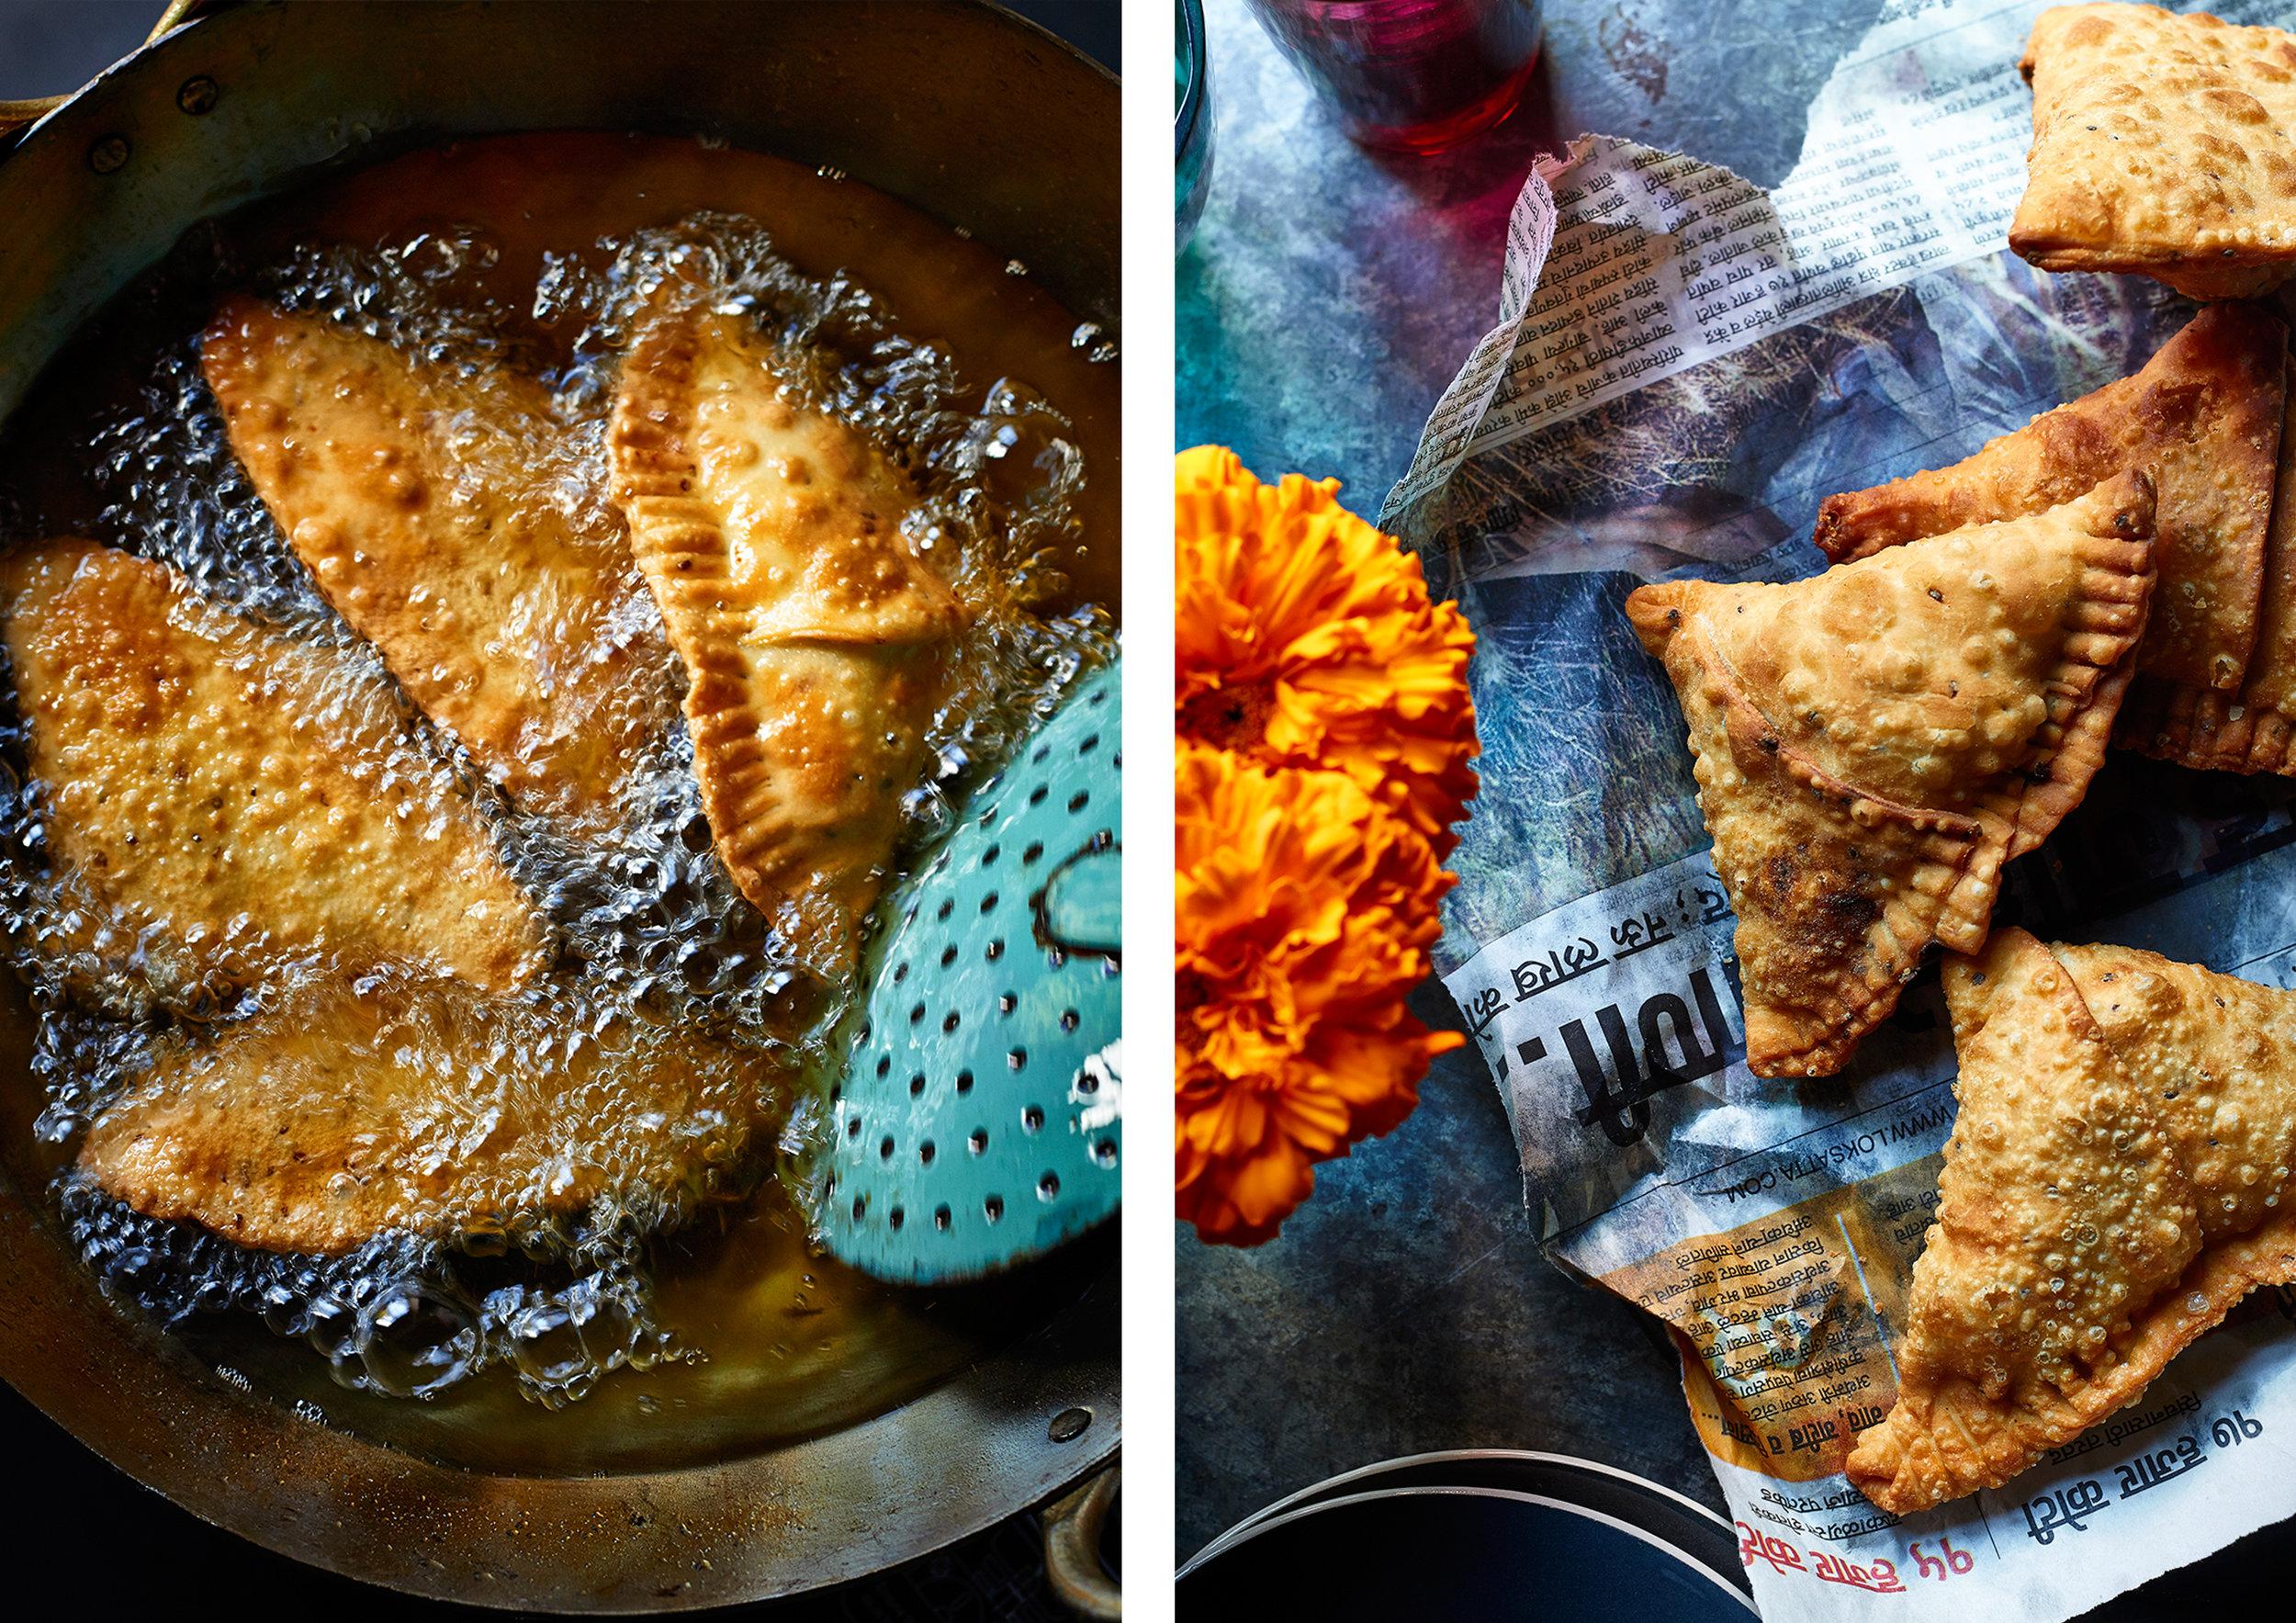 Food Stylist: Jas Jhalli Prop Stylists: Jas Jhalli & Myself